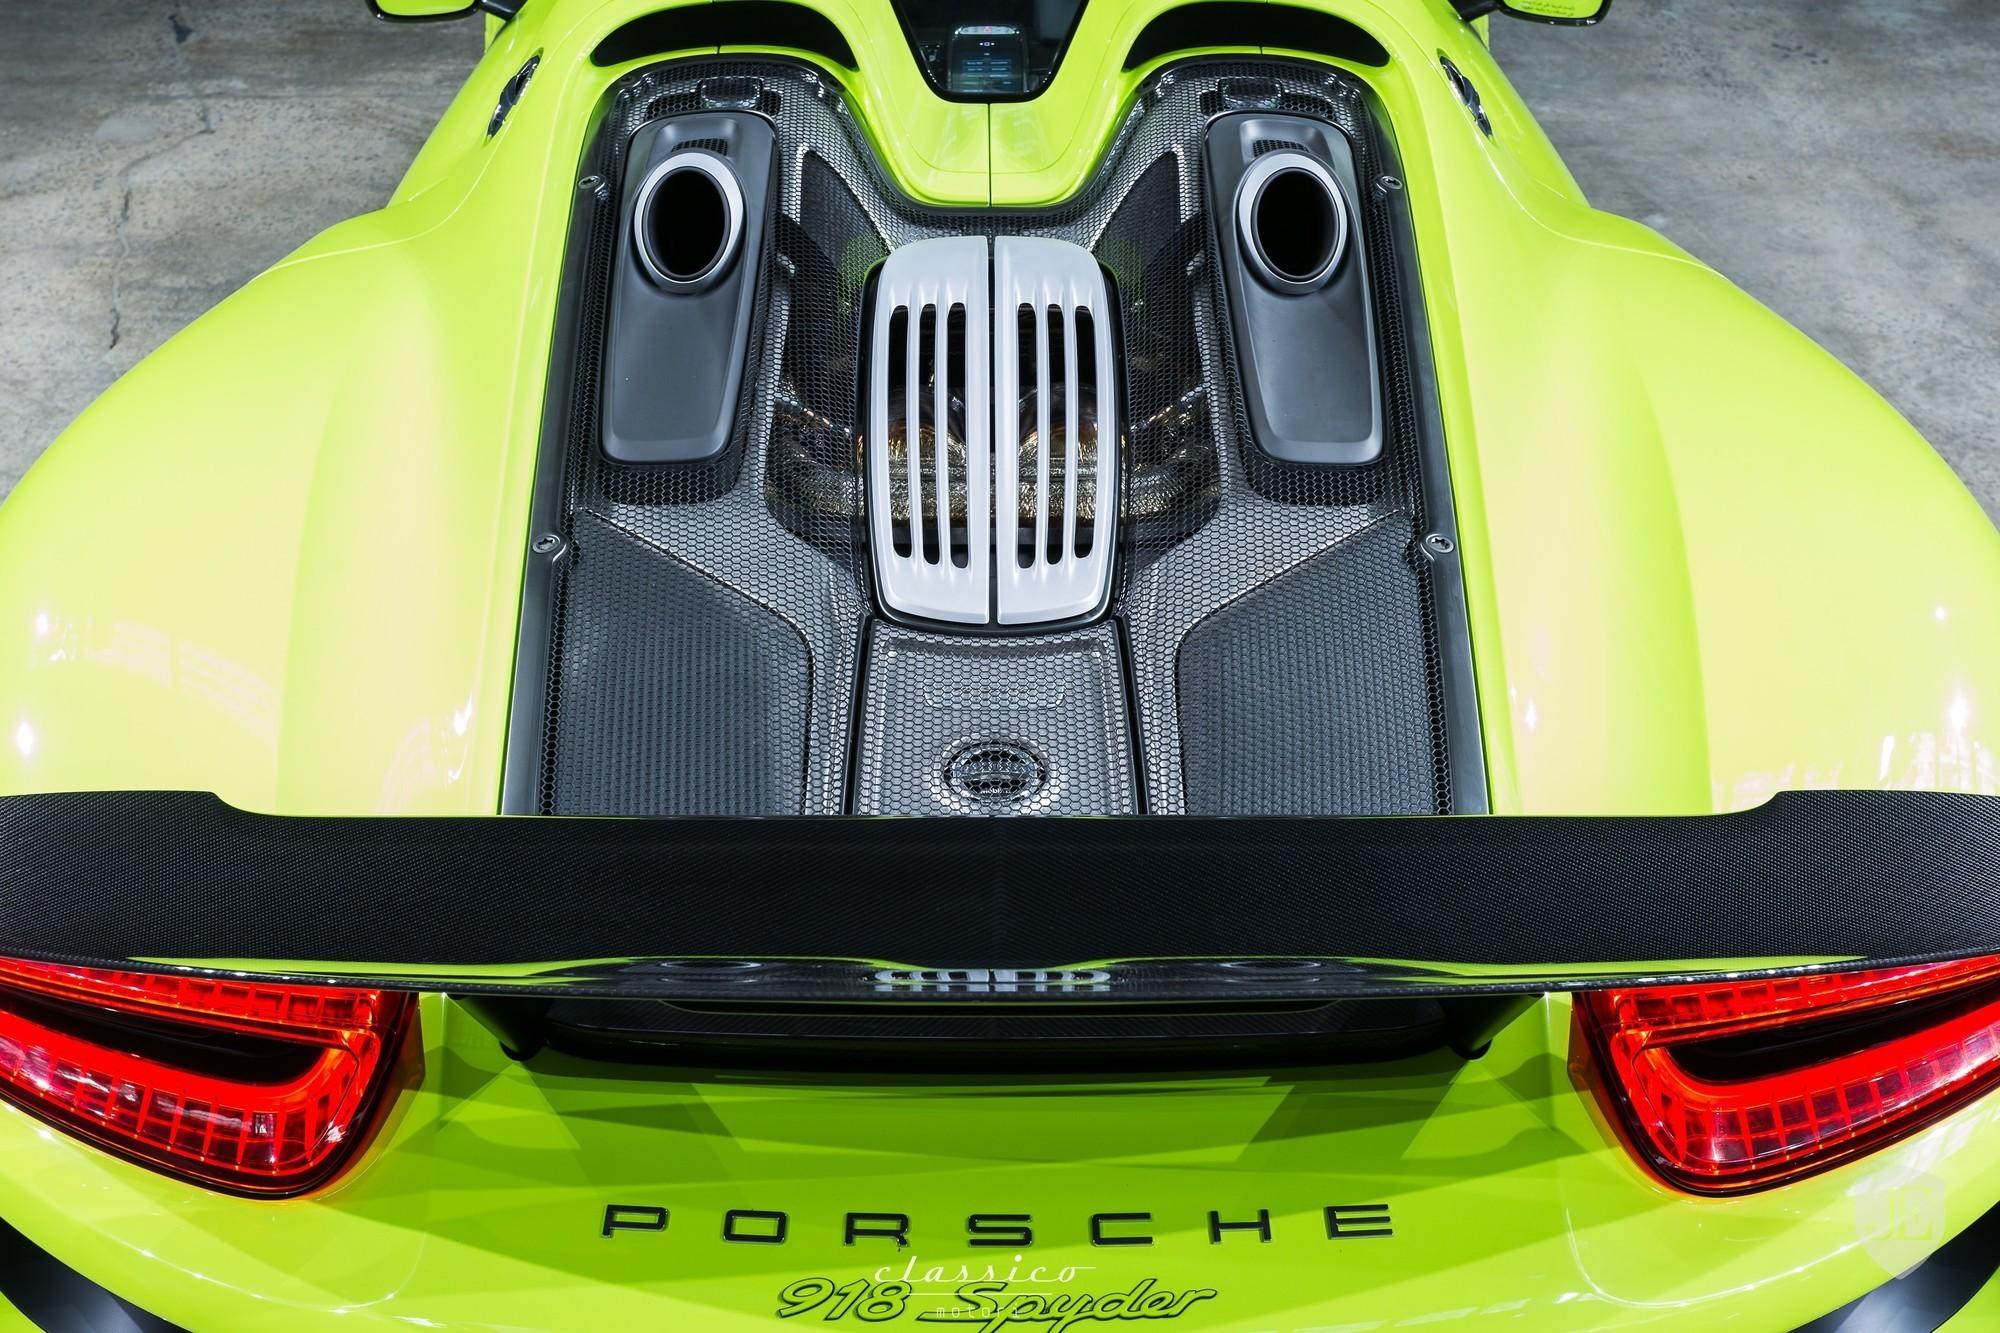 porsche-918-spyder-cm29.jpg